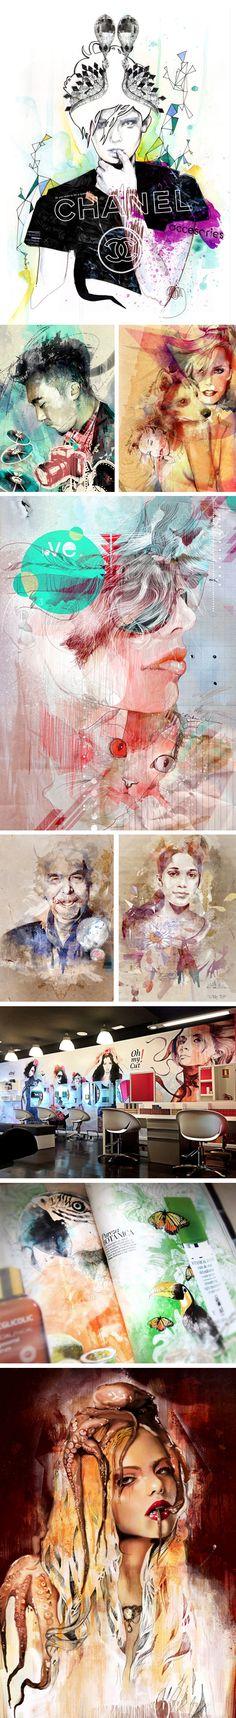 Robert Tirado Illustrator. Jessica Rebelo's blog